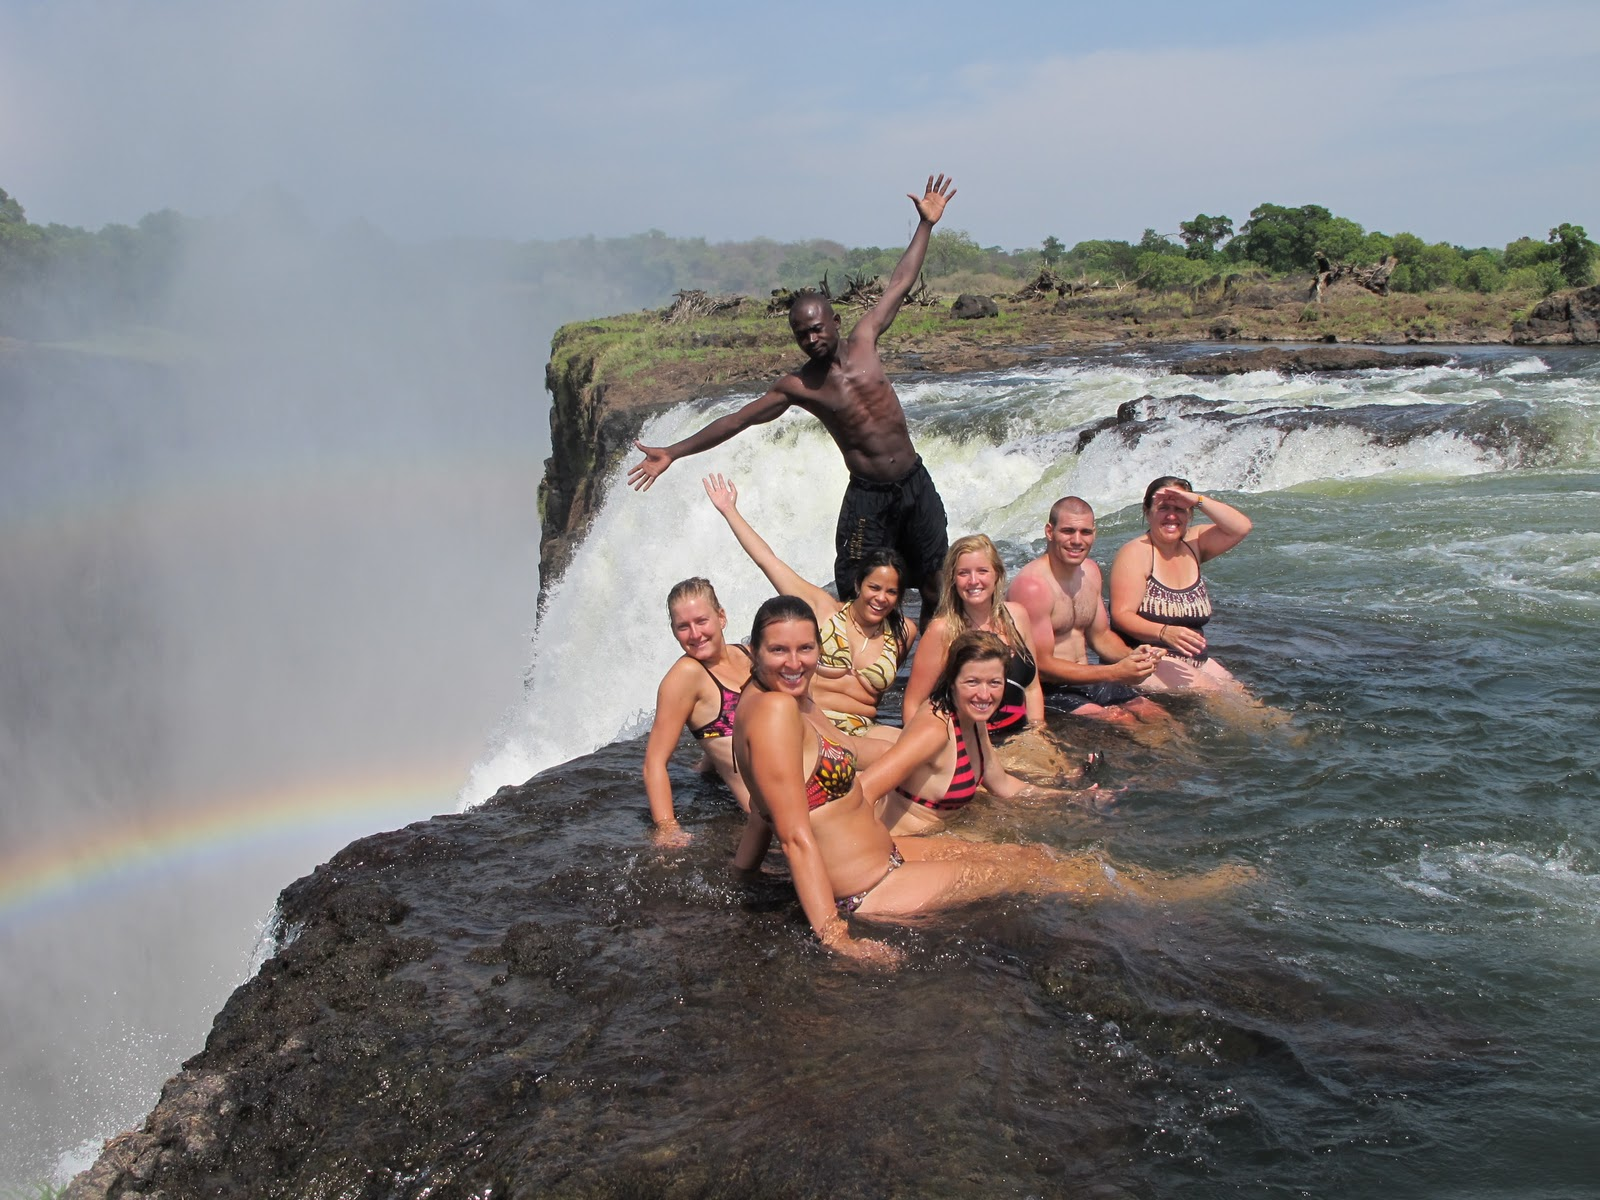 Devils_Pool_Victoria_Falls_Zambia-Zimbabwe_thesuiteworld